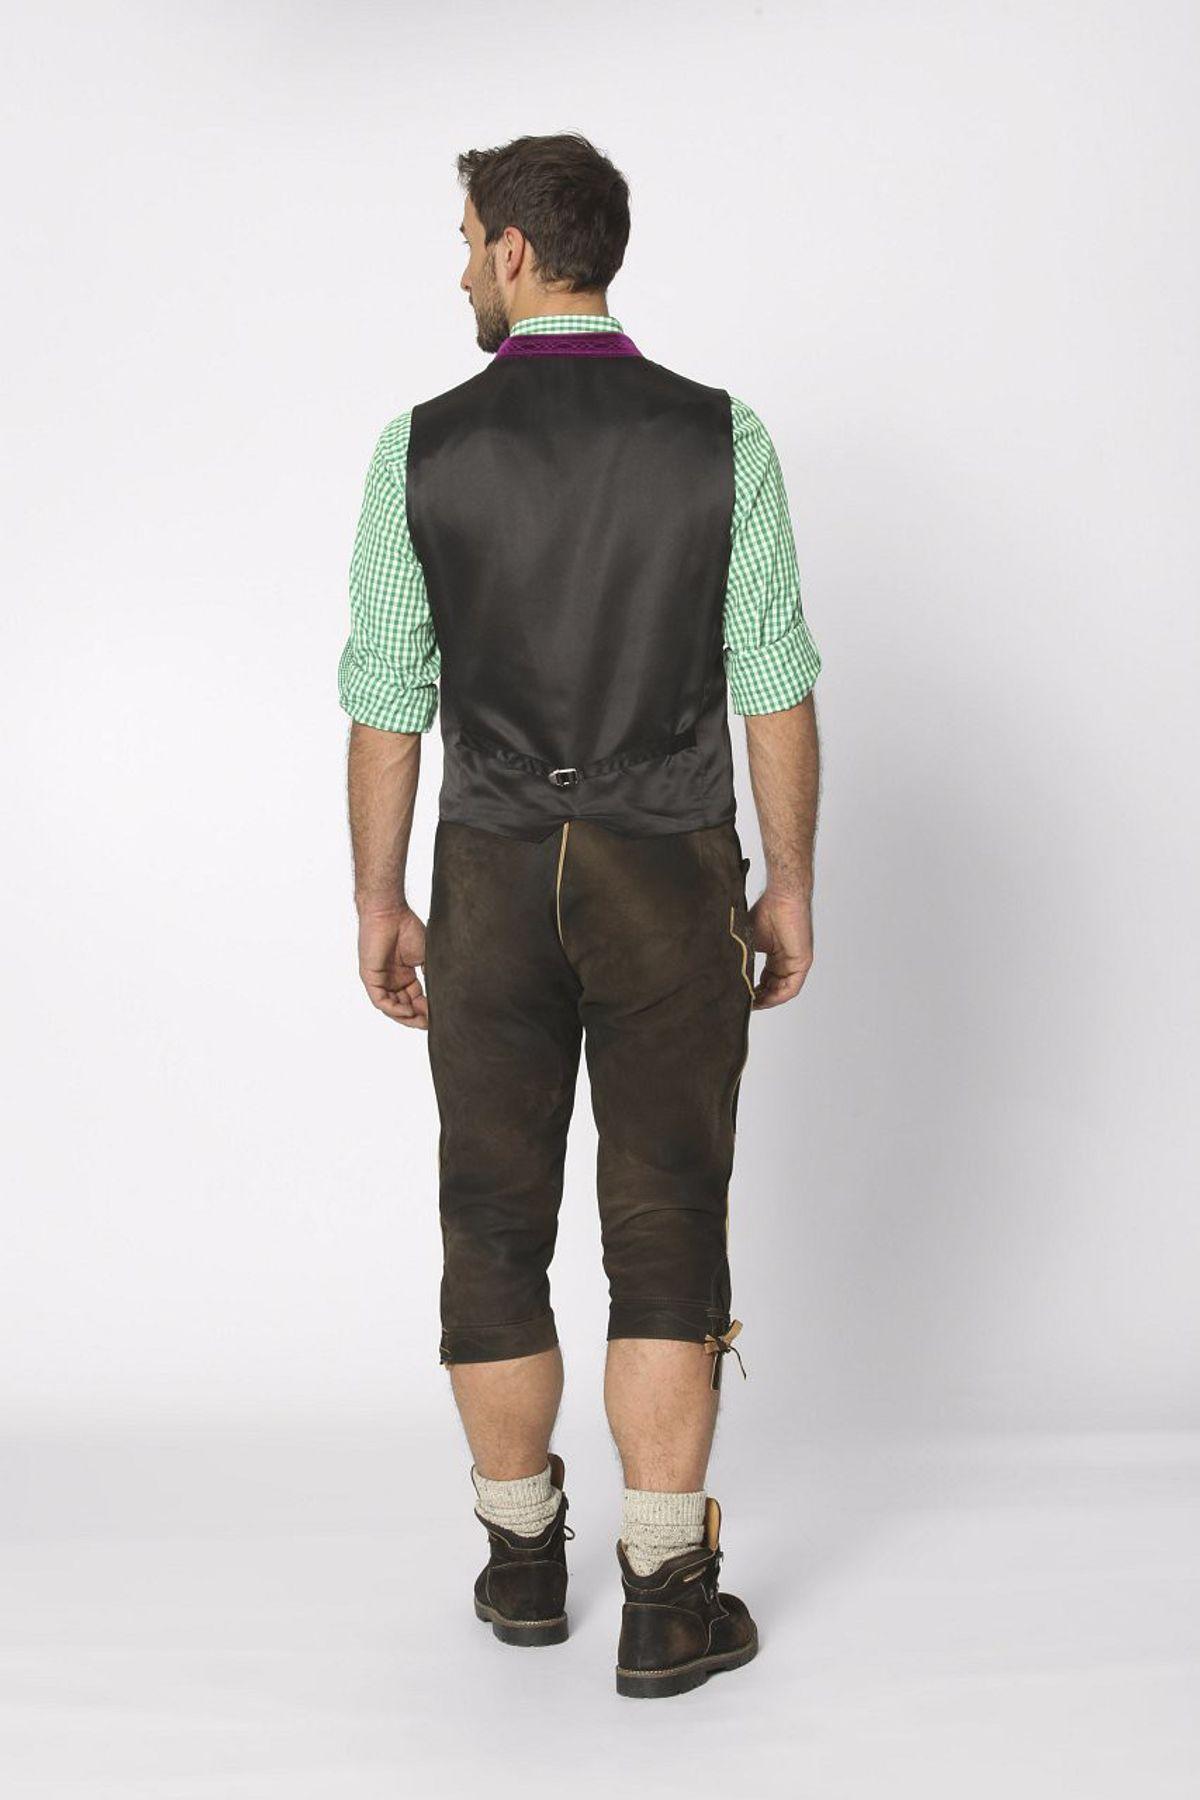 Stockerpoint - Herren Trachten Weste in verschiedenen Farbtönen, Calzado – Bild 23